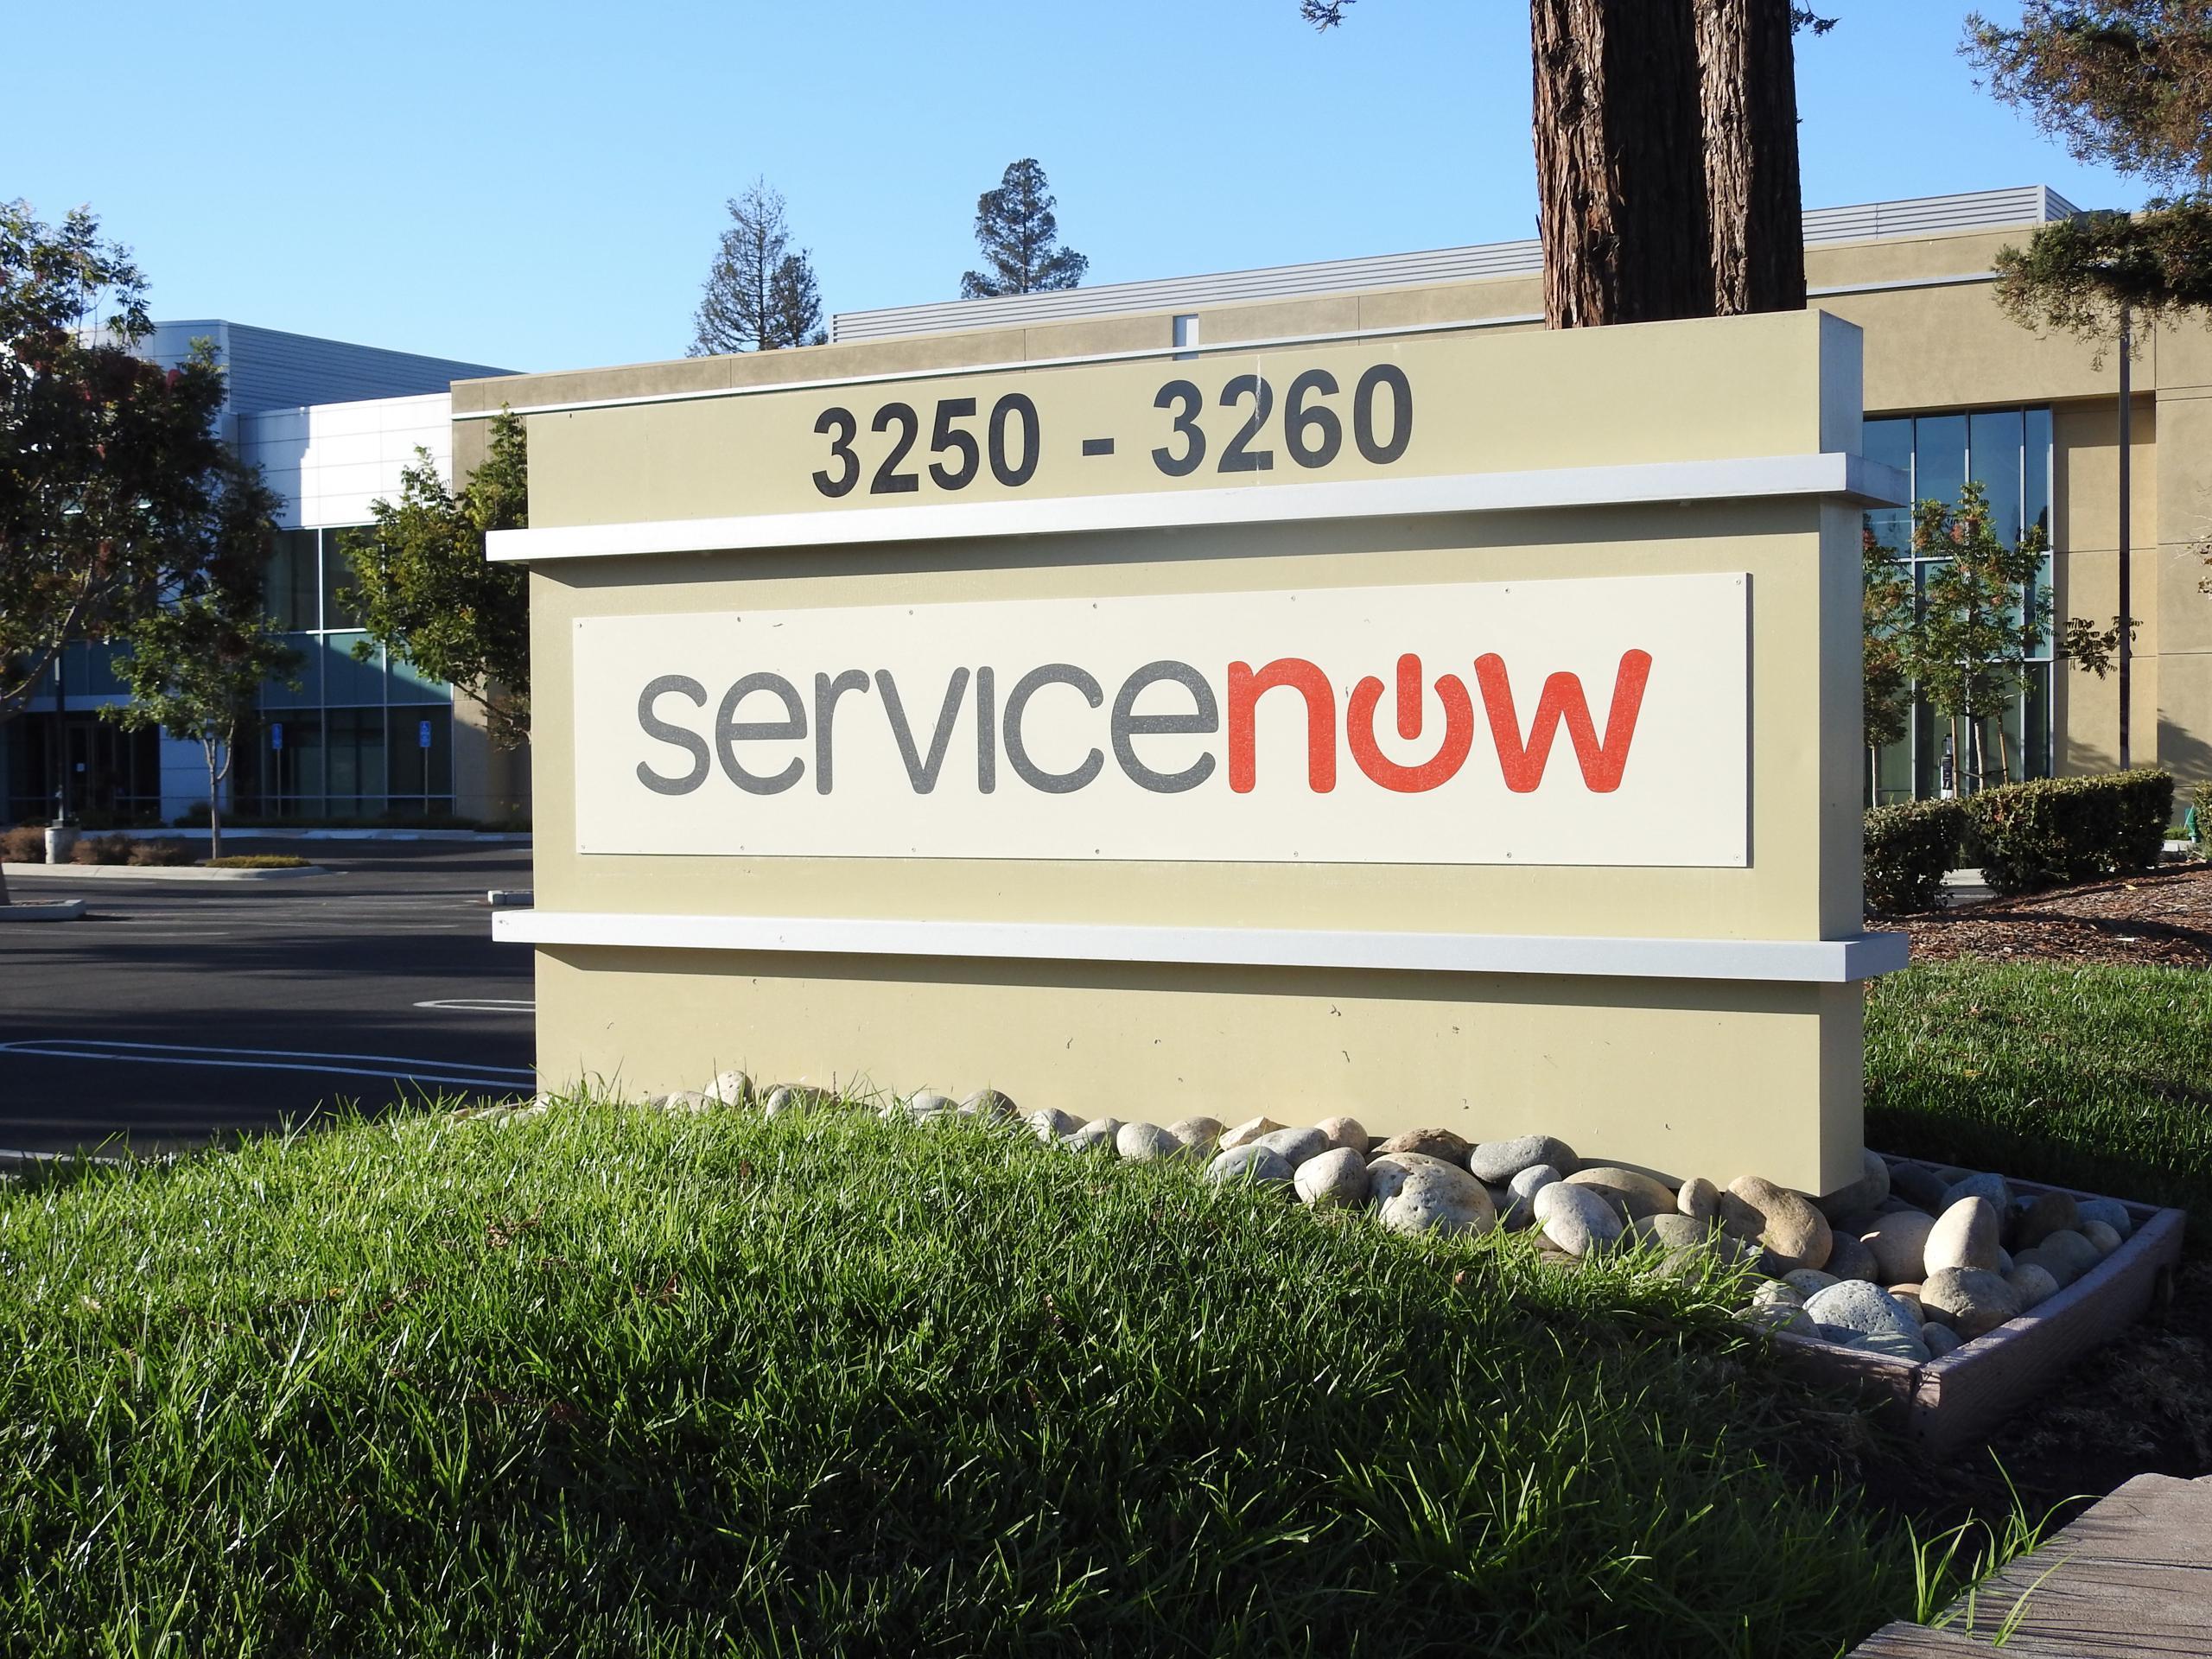 Entrance to ServiceNow's corporate headquarters in Santa Clara, California.